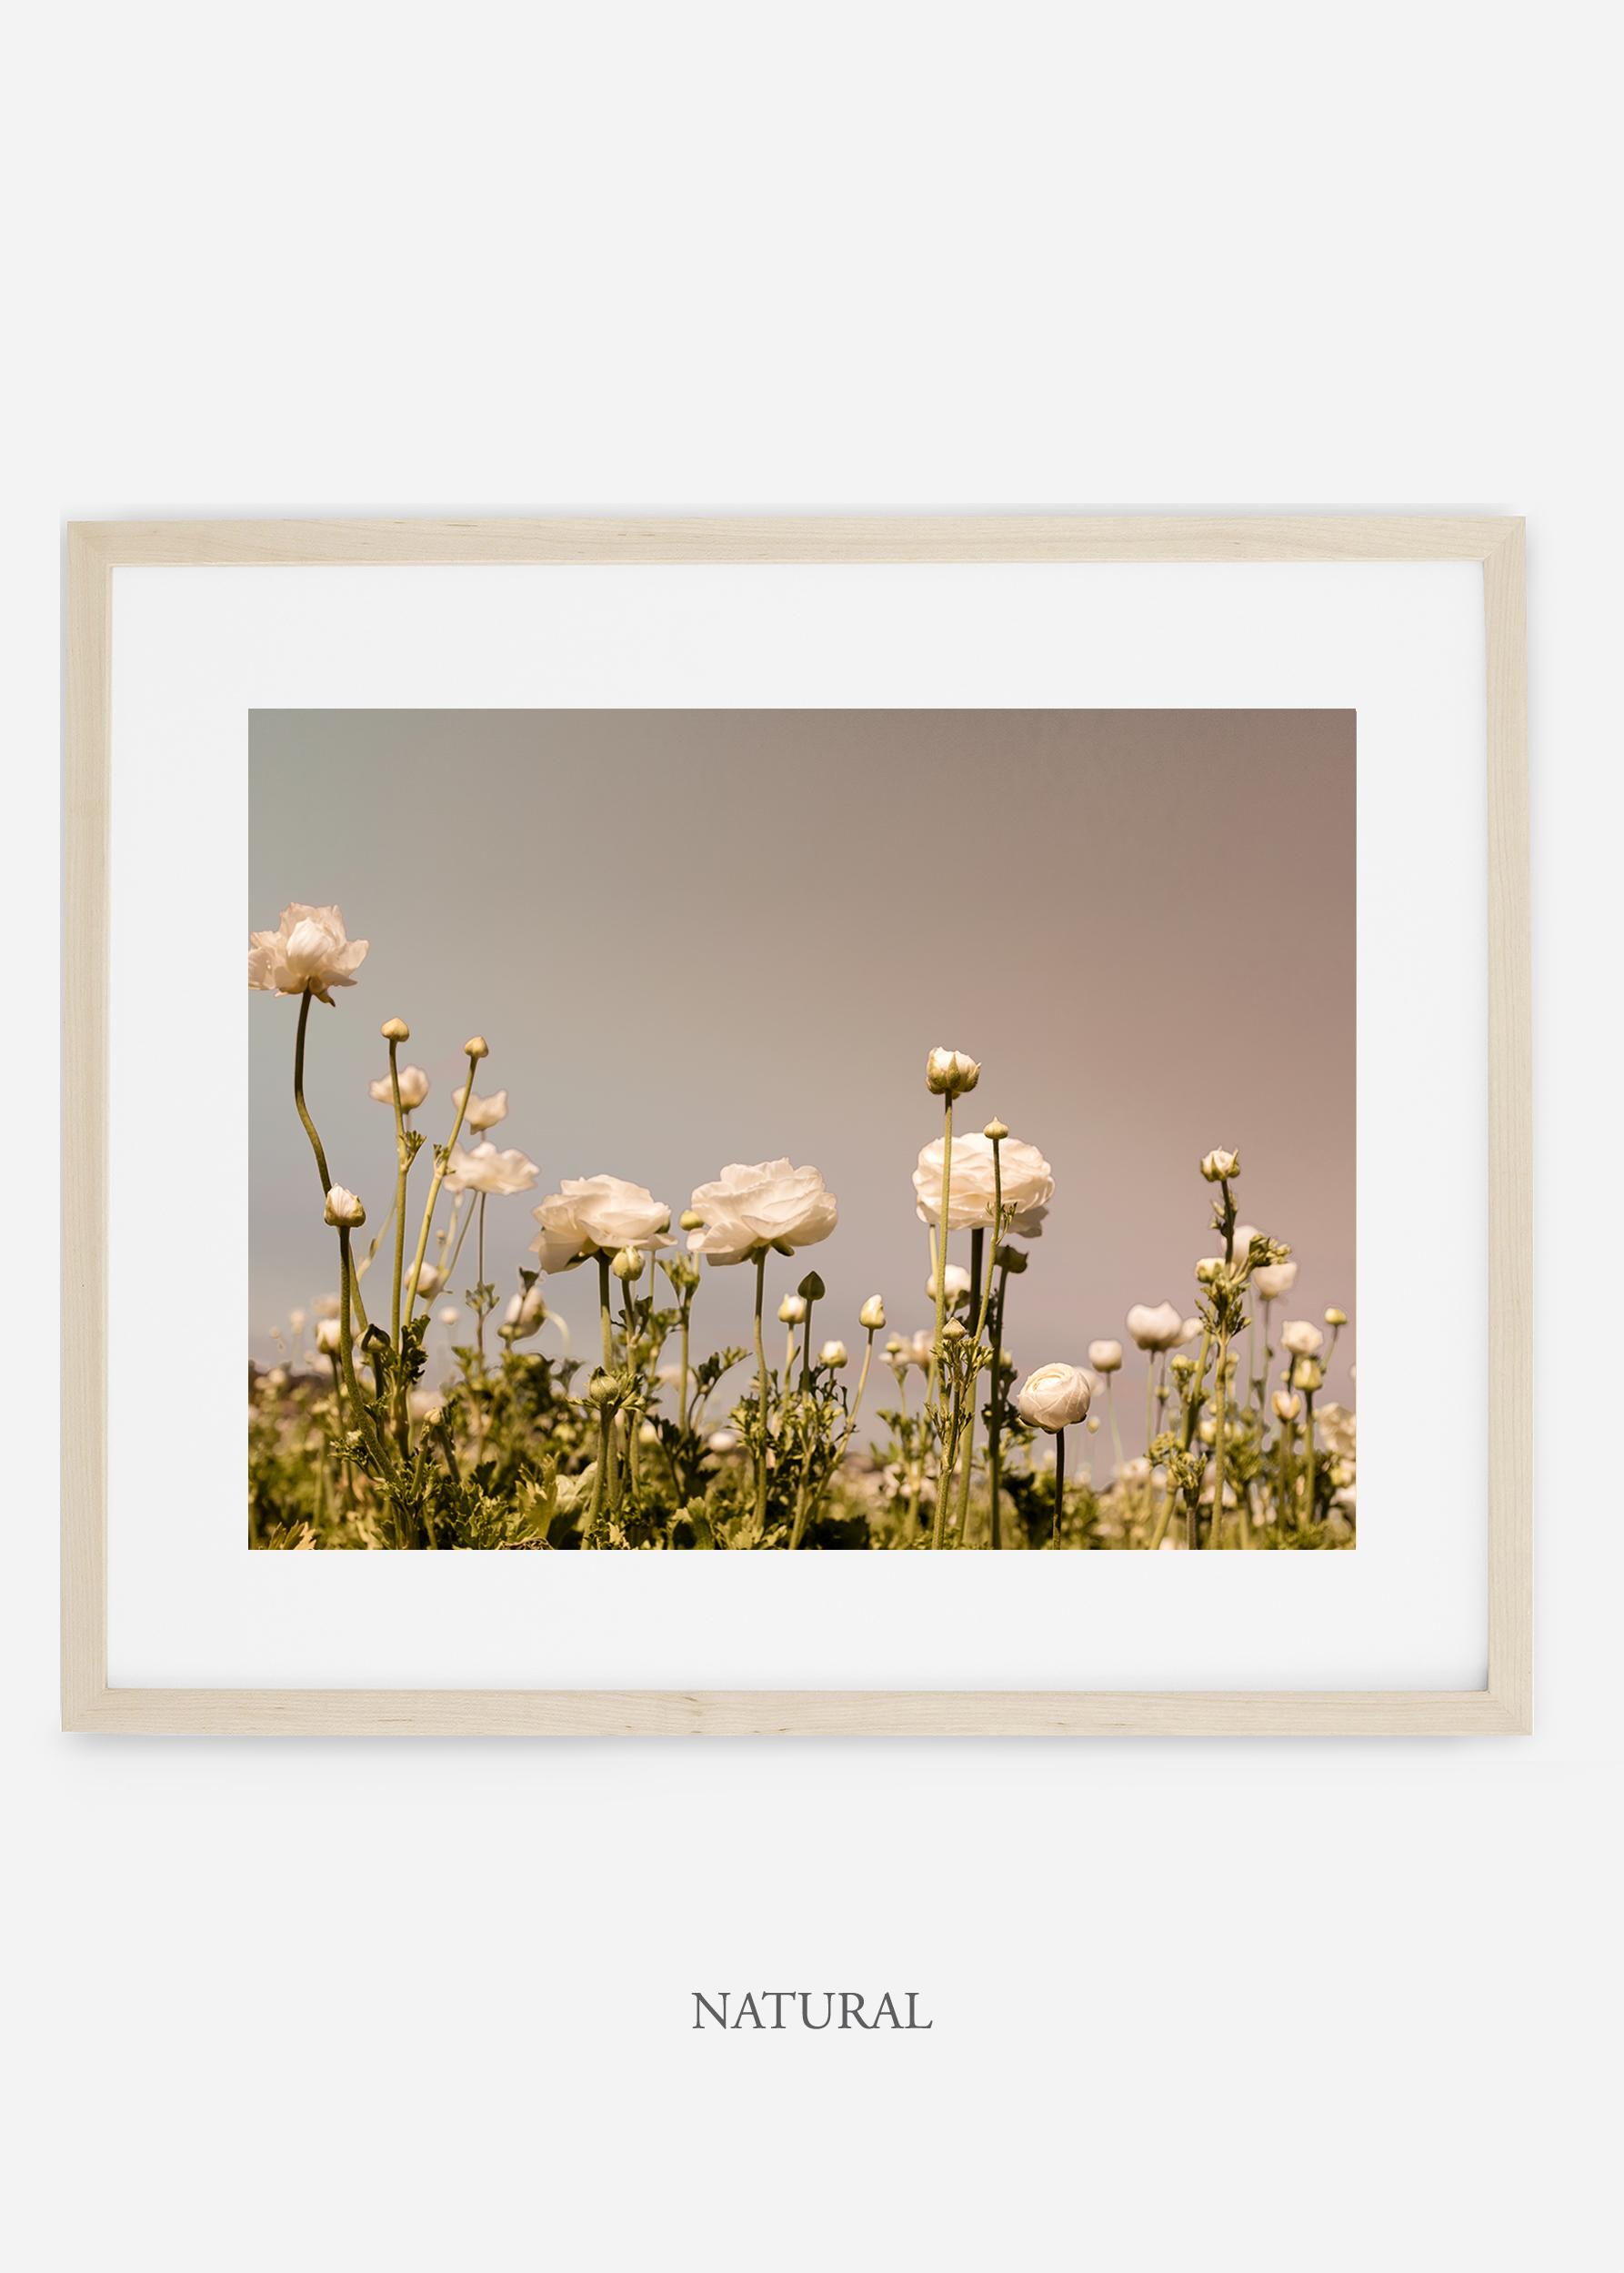 wilder-california-natural-frame-flora-6-minimal-botanical-print-art-interior-design.jpg